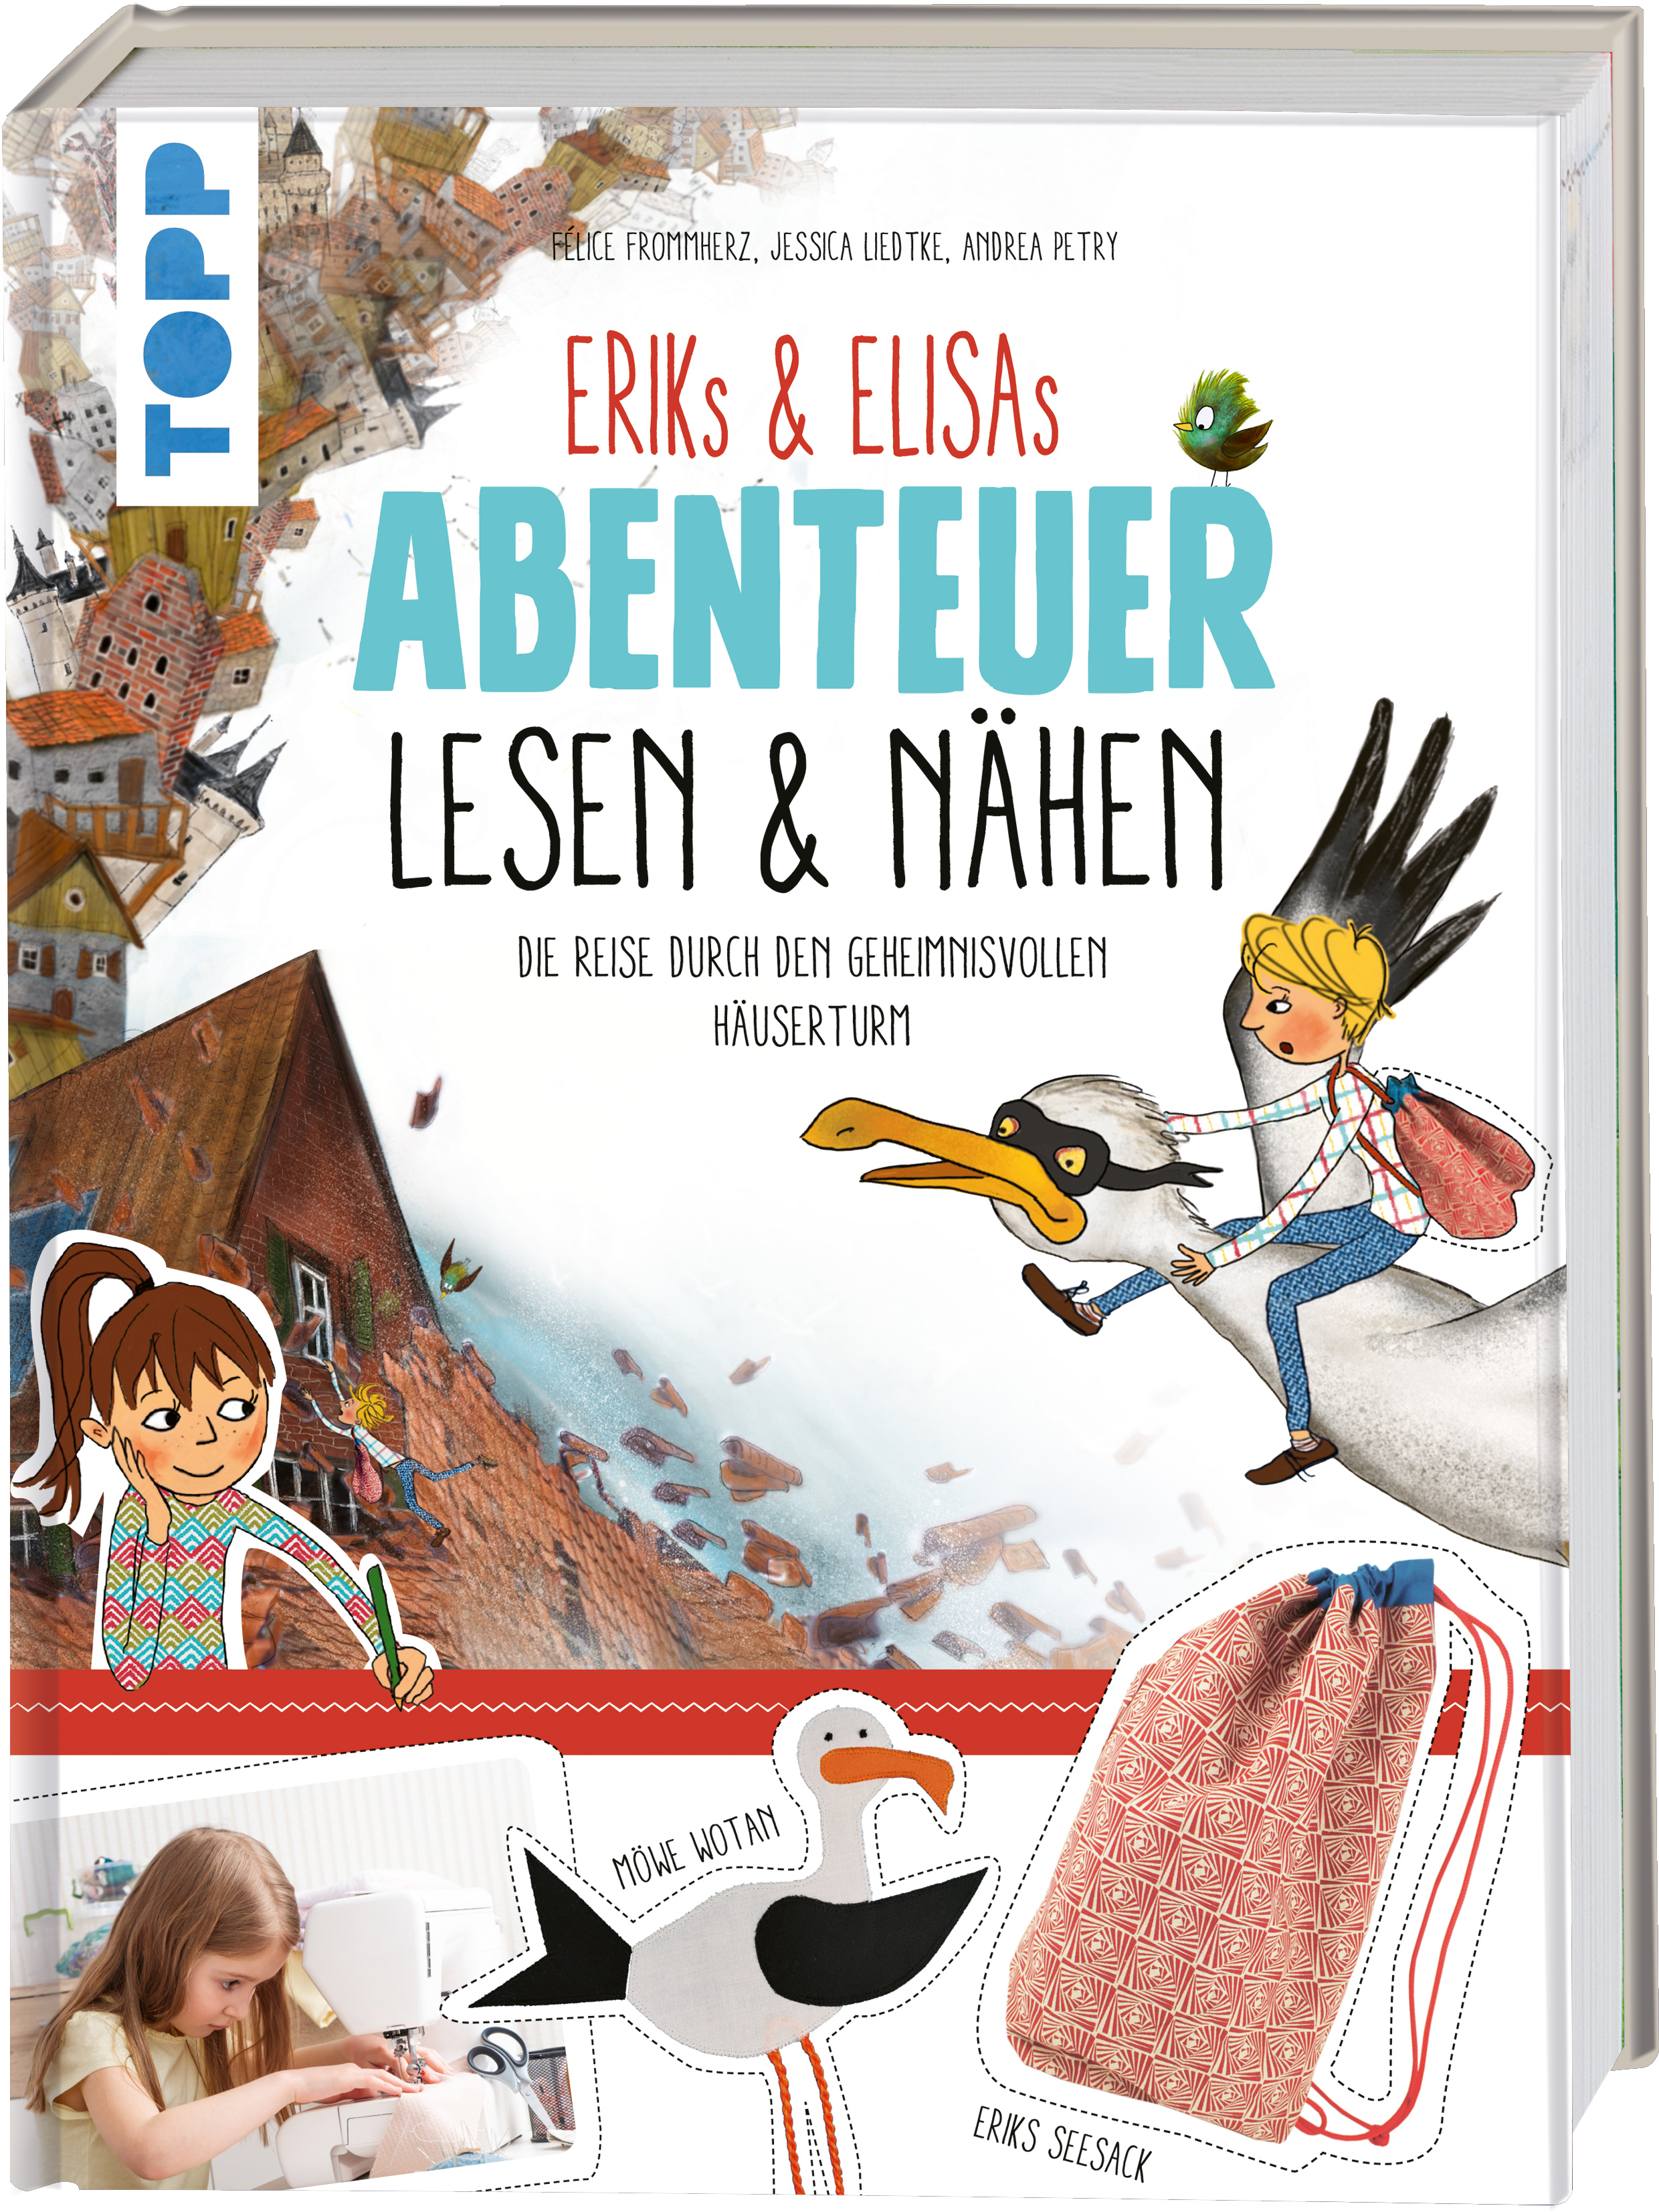 Topp 4954 Erik&Elisas Abenteuer lesen & nähen